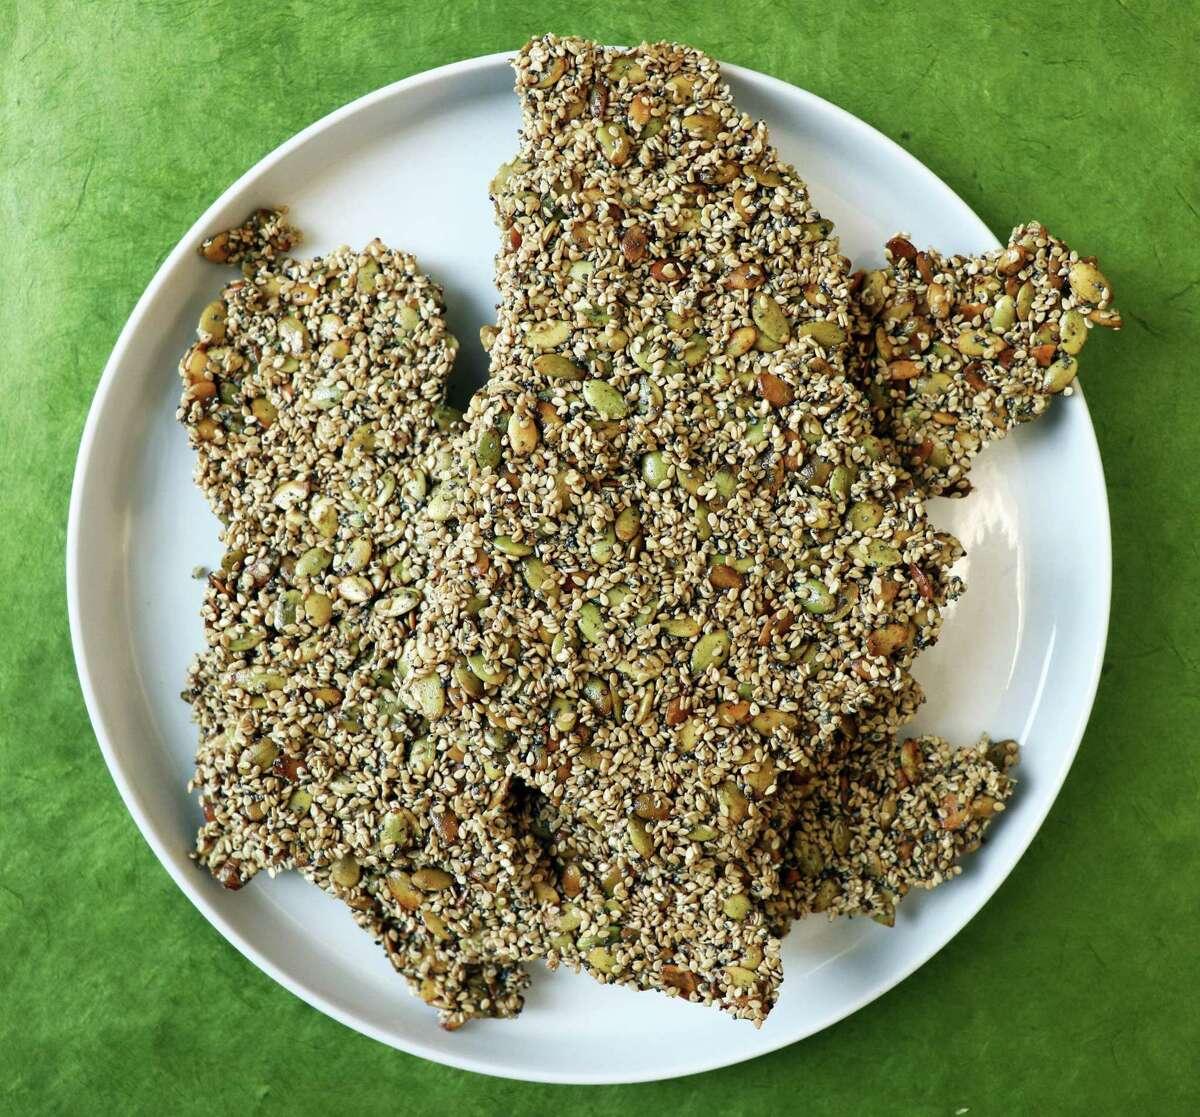 Seed crackers from chef Anita Jaisinghani